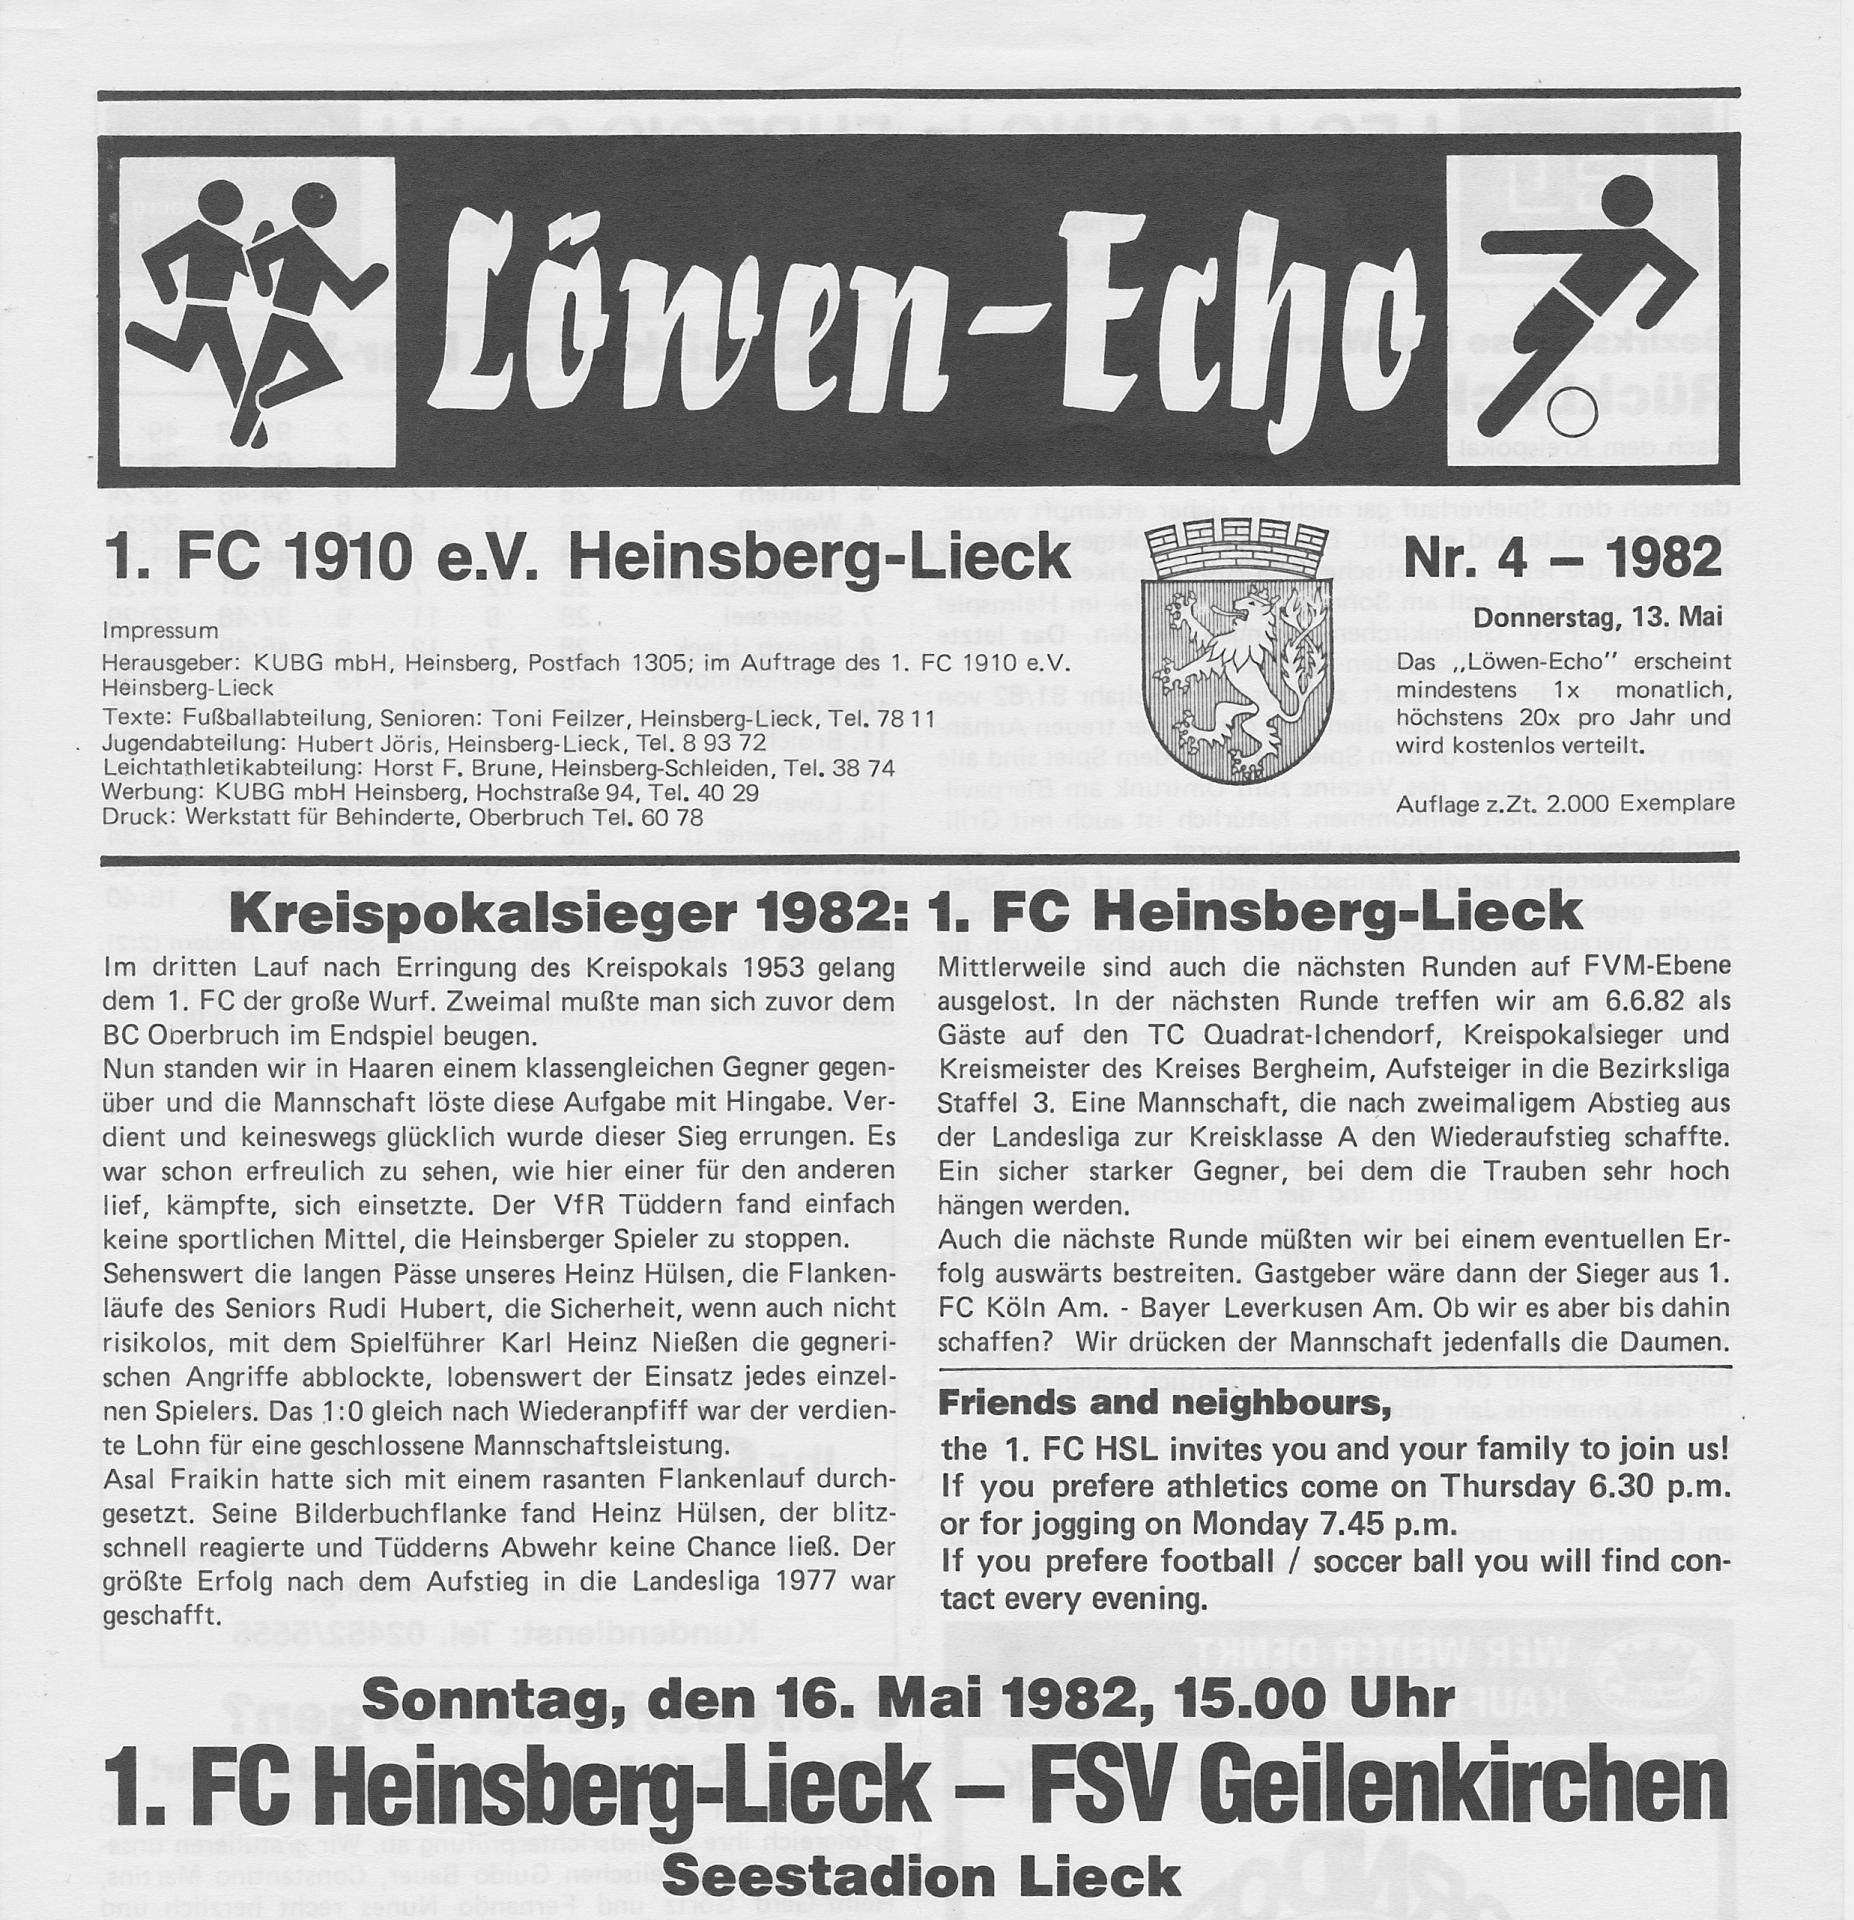 Löwen-Echo